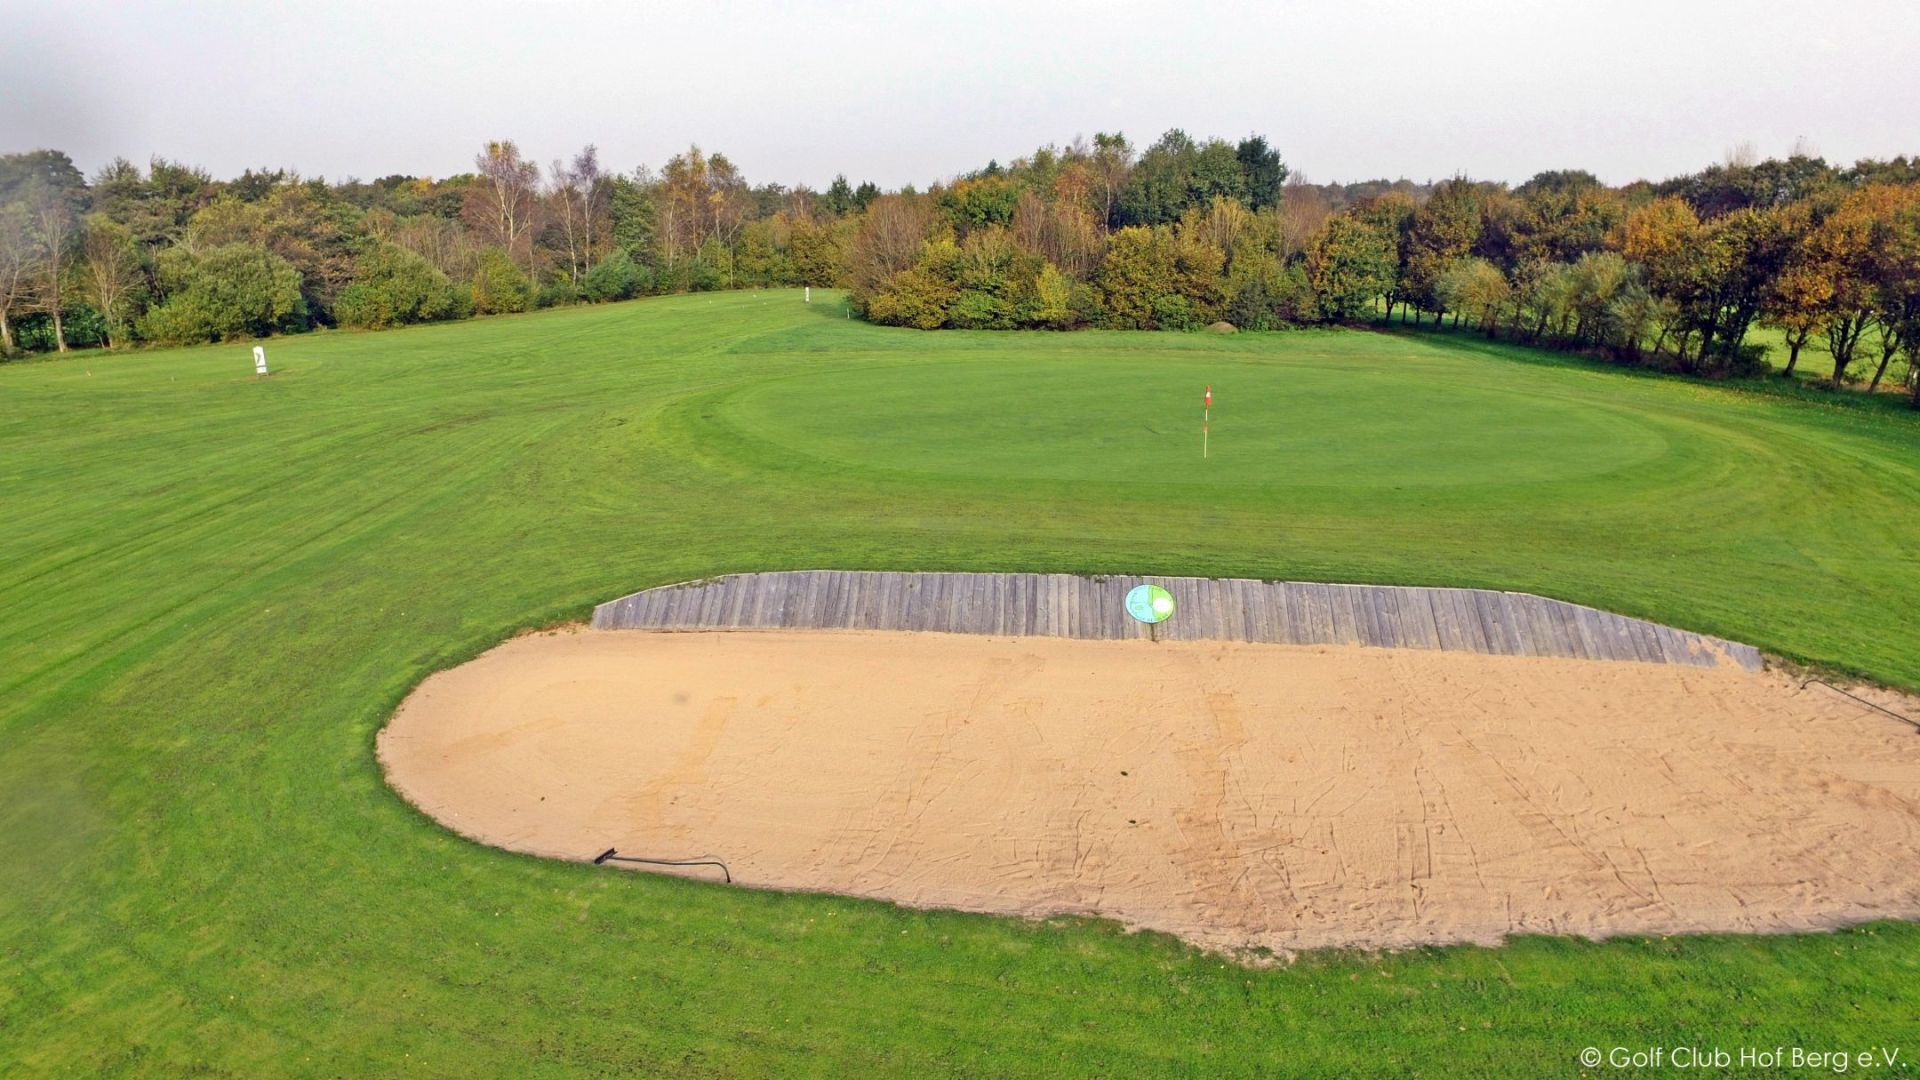 Golfplatz in Stadum